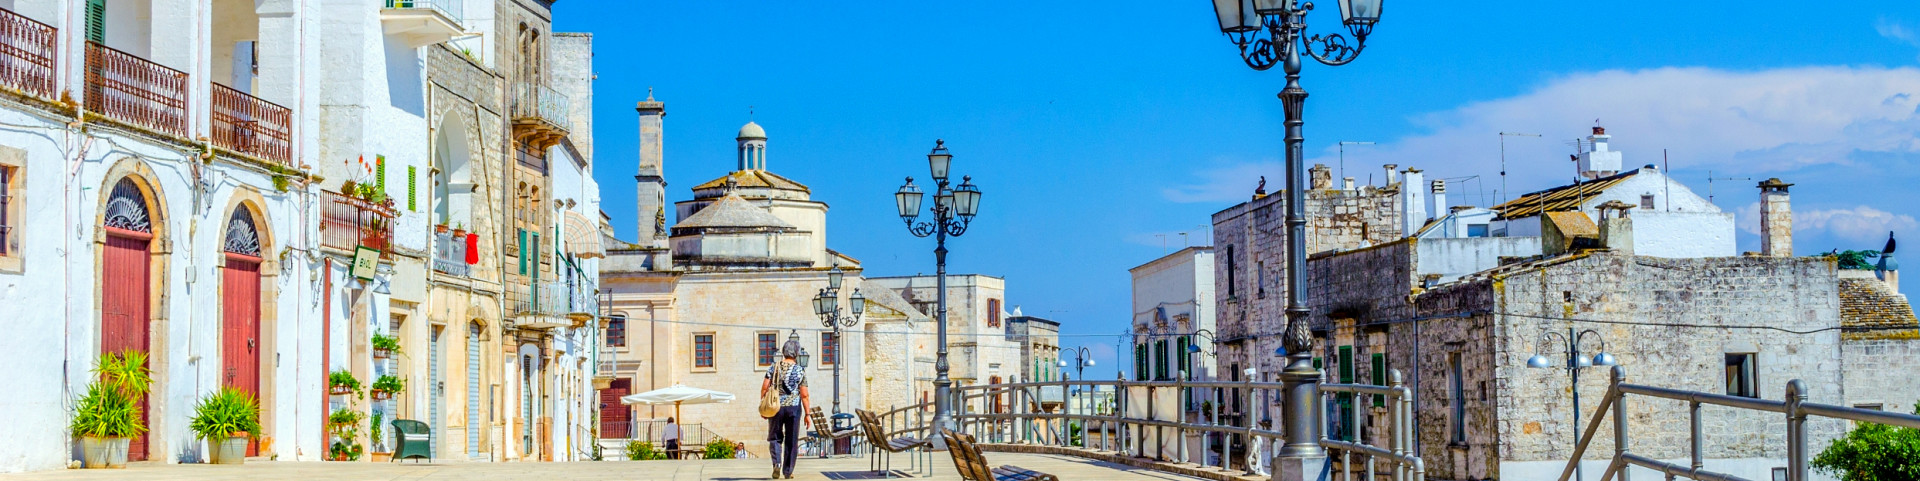 Historické centrum Carovigno